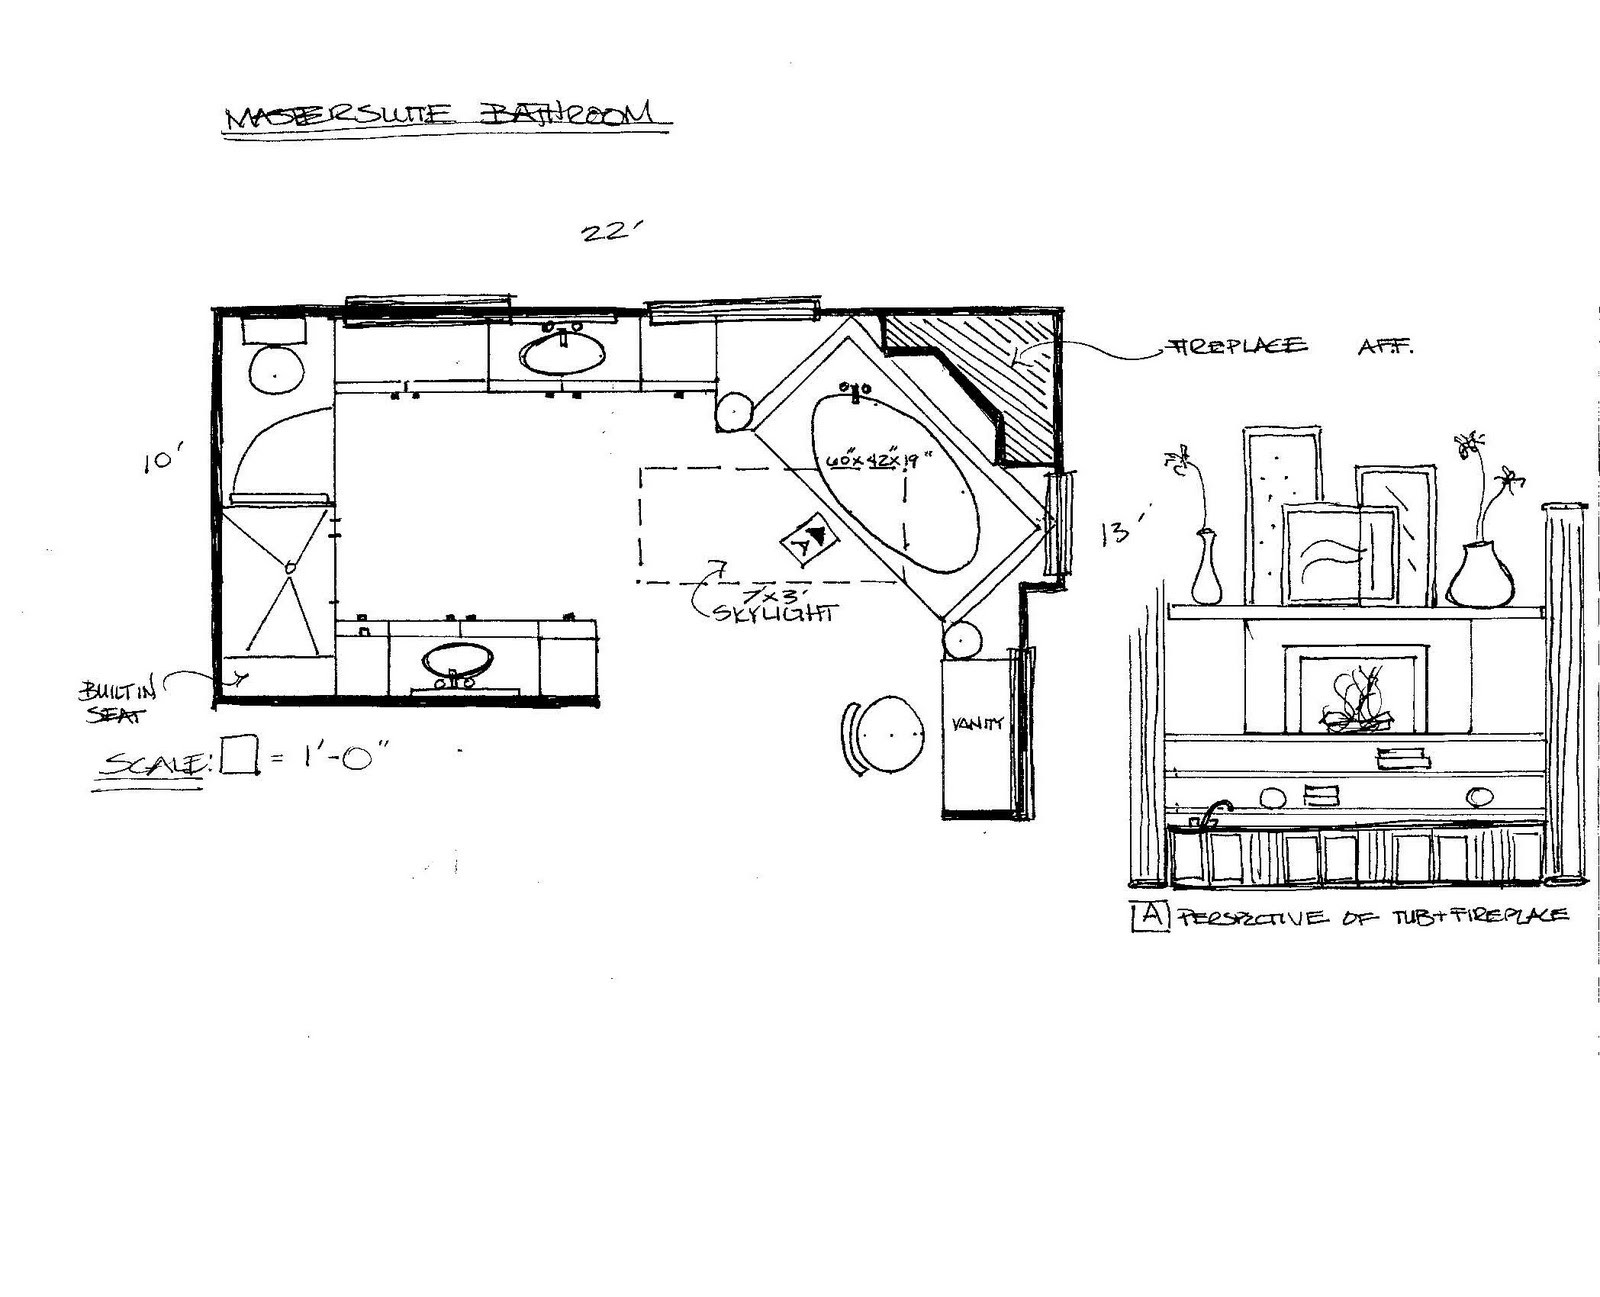 Master Bathroom Layout Plans  Awesome Master Bathroom Floor Plan Home